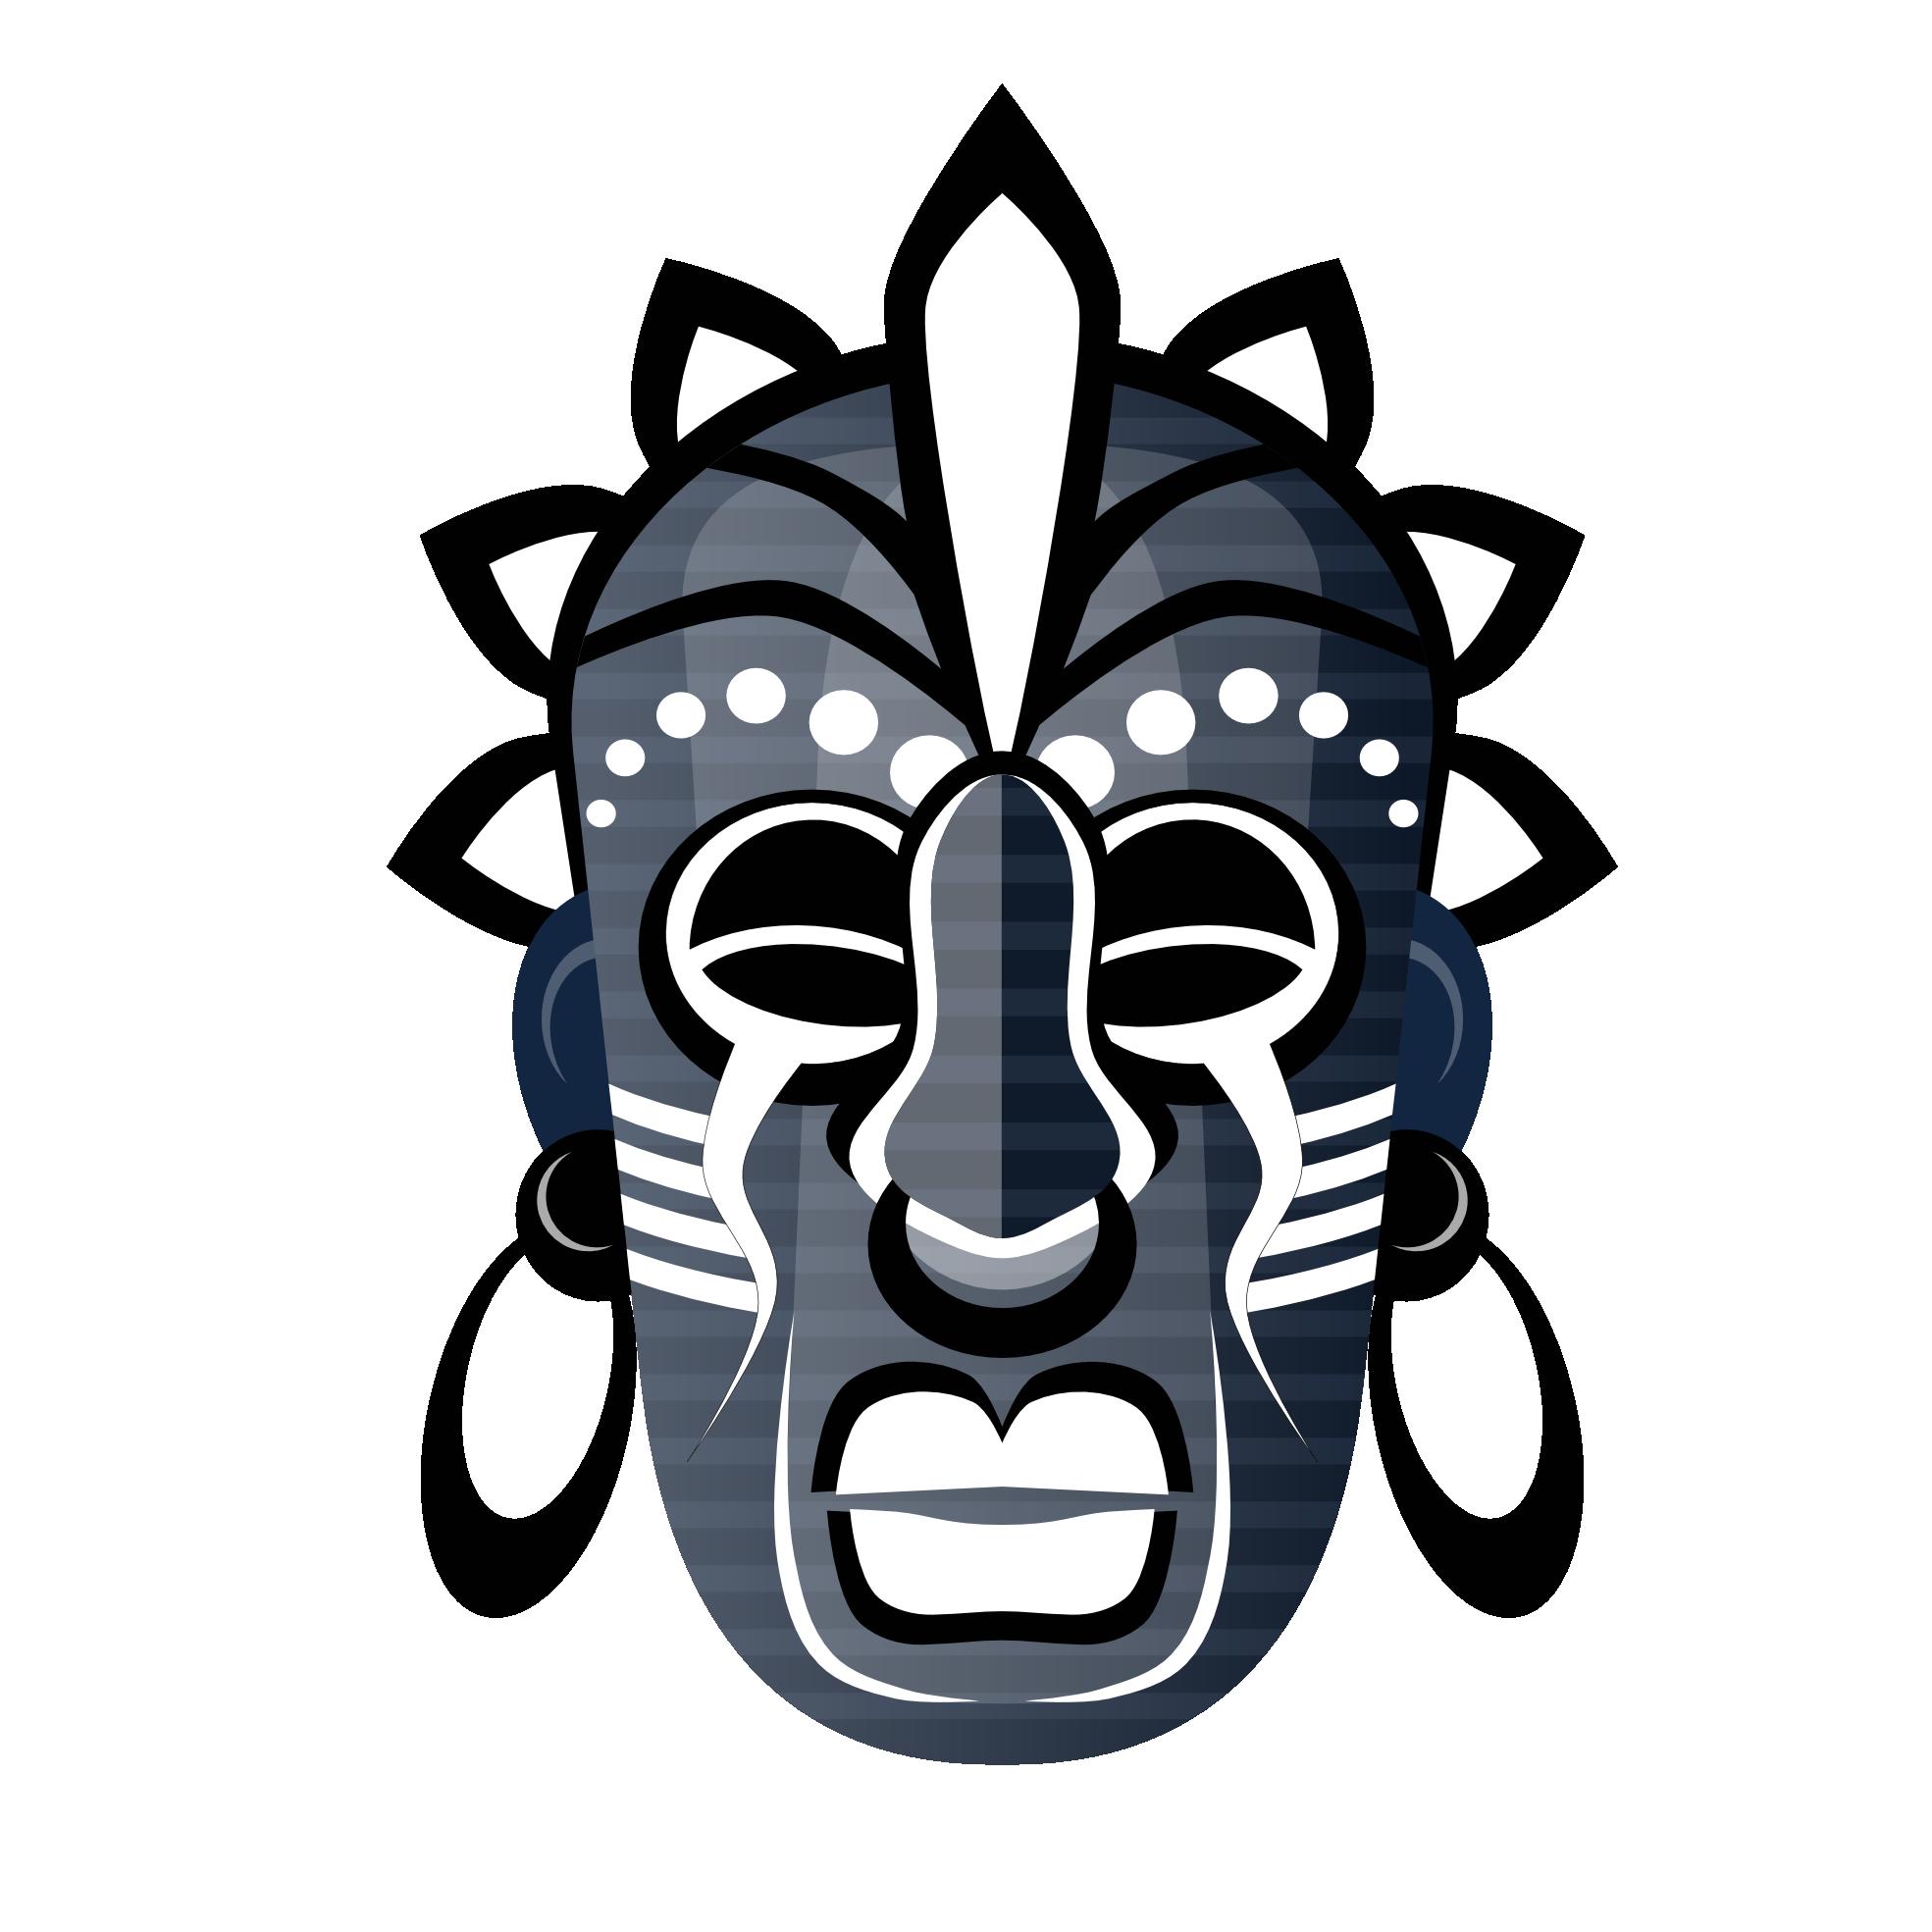 Sun tribal clipart clip black and white stock Masks clipart tribe #6   Mask   Pinterest   Masking and Explore clip black and white stock